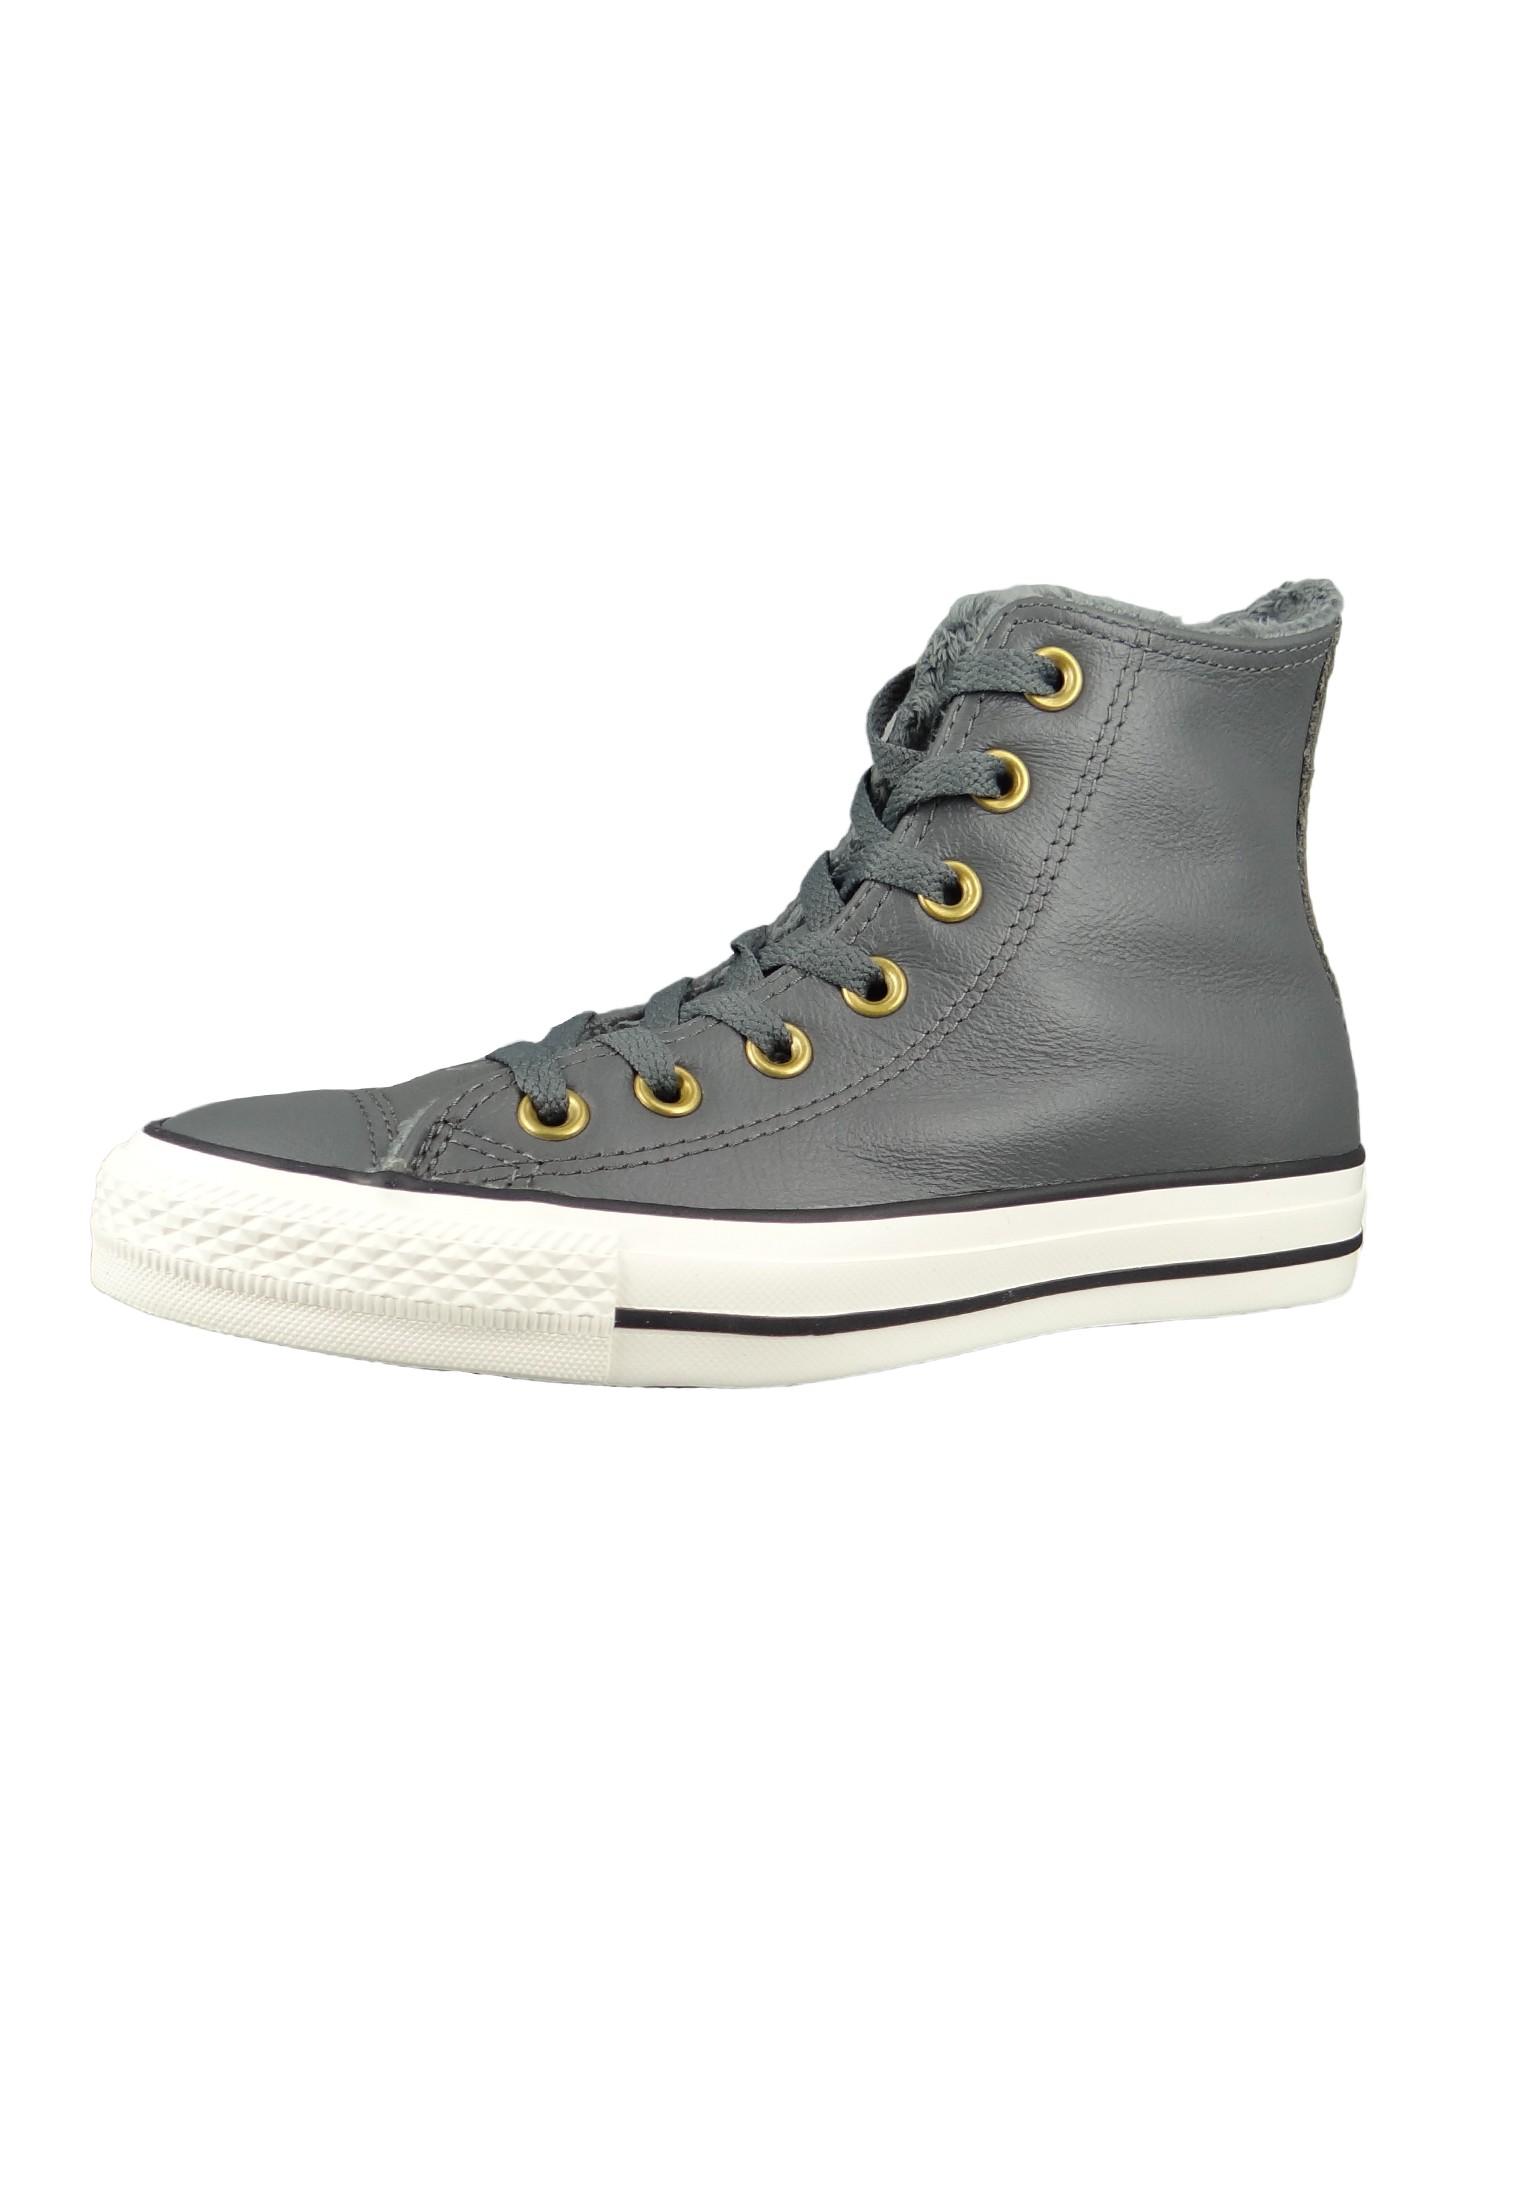 Converse Chuck Taylor All Star Hi Damen-Sneaker Thunder/Egret 37 x9iRLK